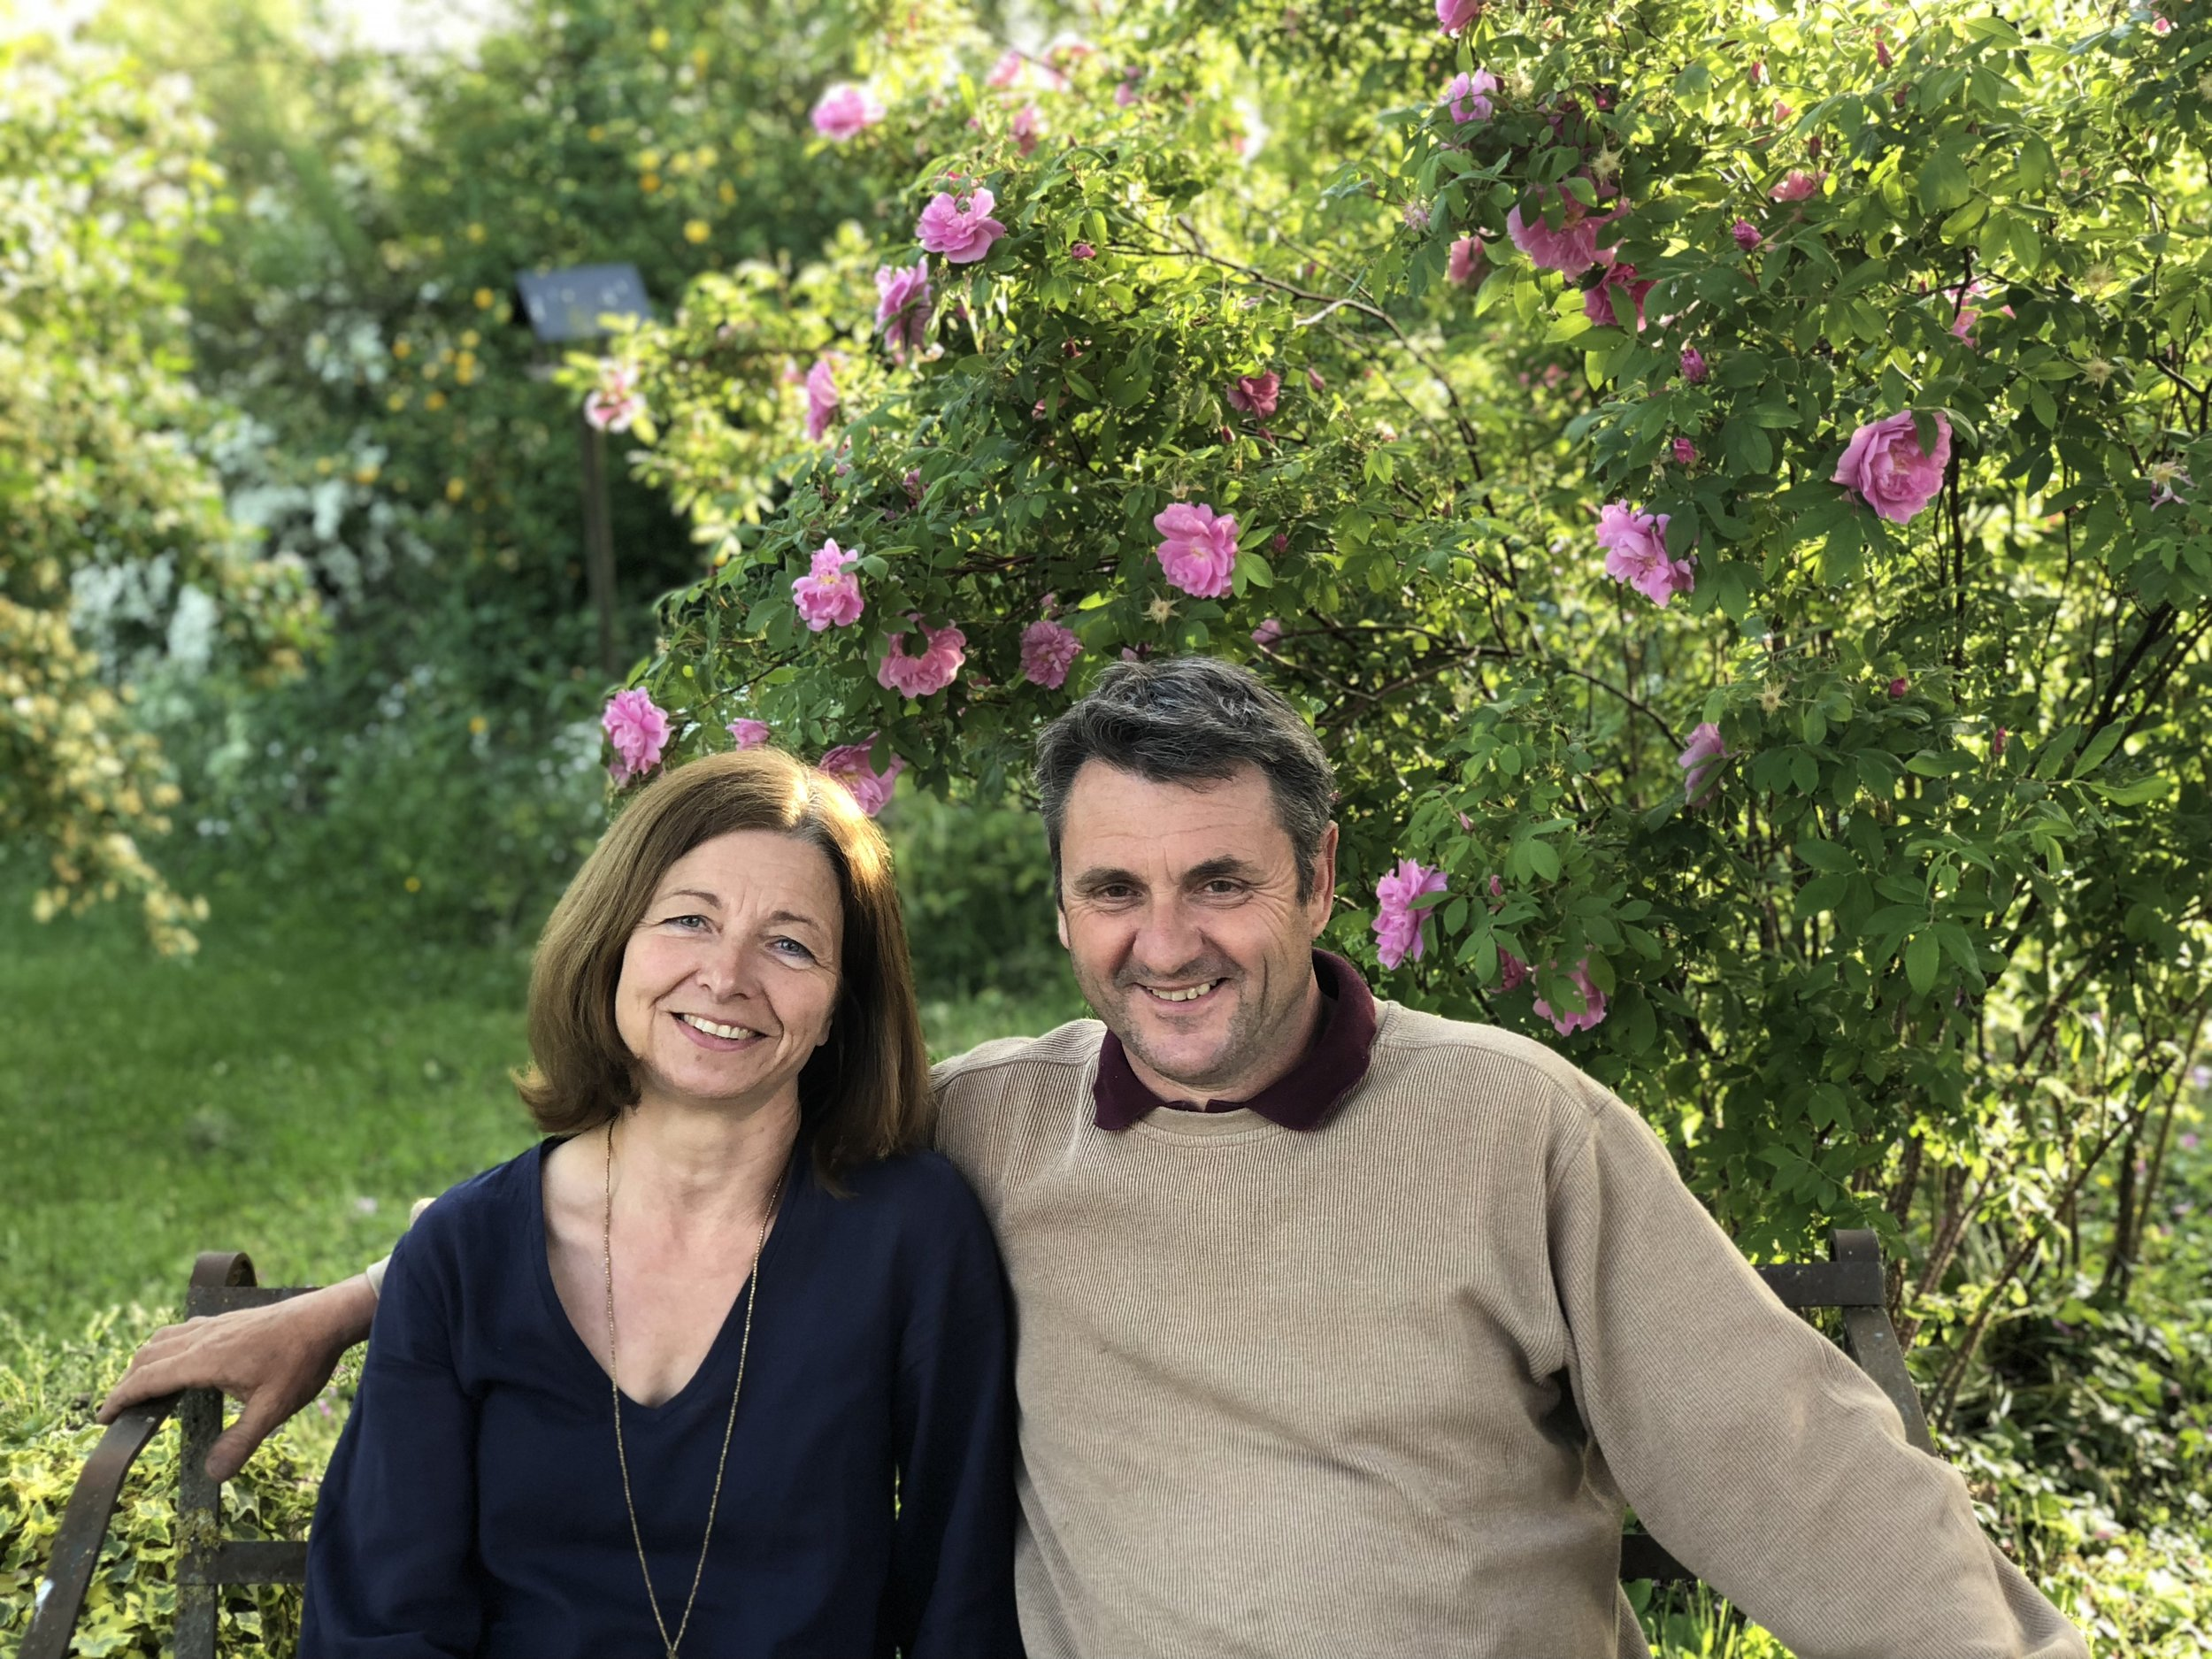 Valérie Lahaye-Auger and Benoit Lahaye